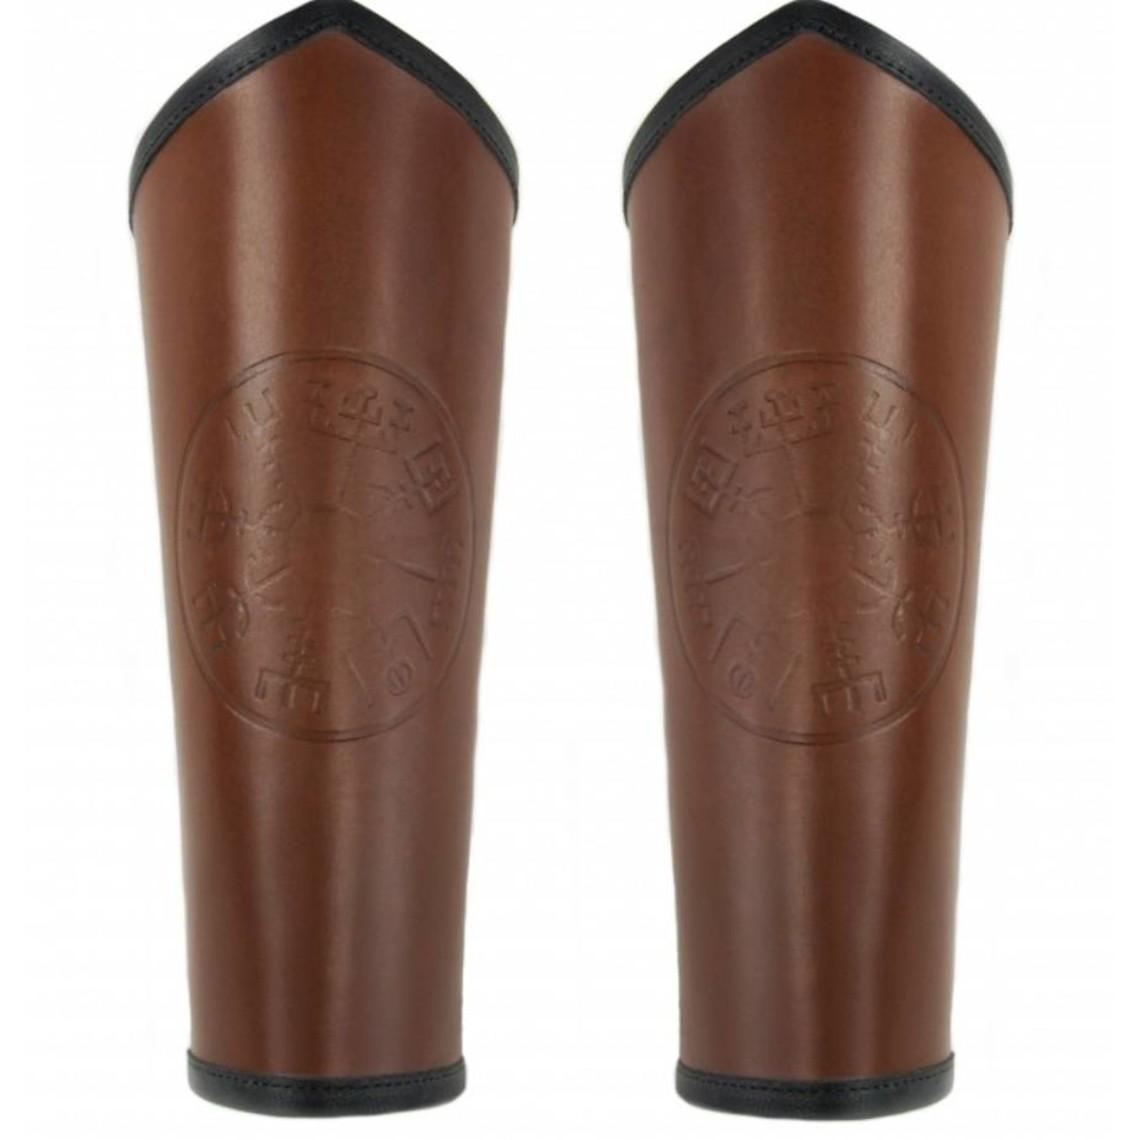 Leonardo Carbone Armbeschermers Vegvisir, bruin